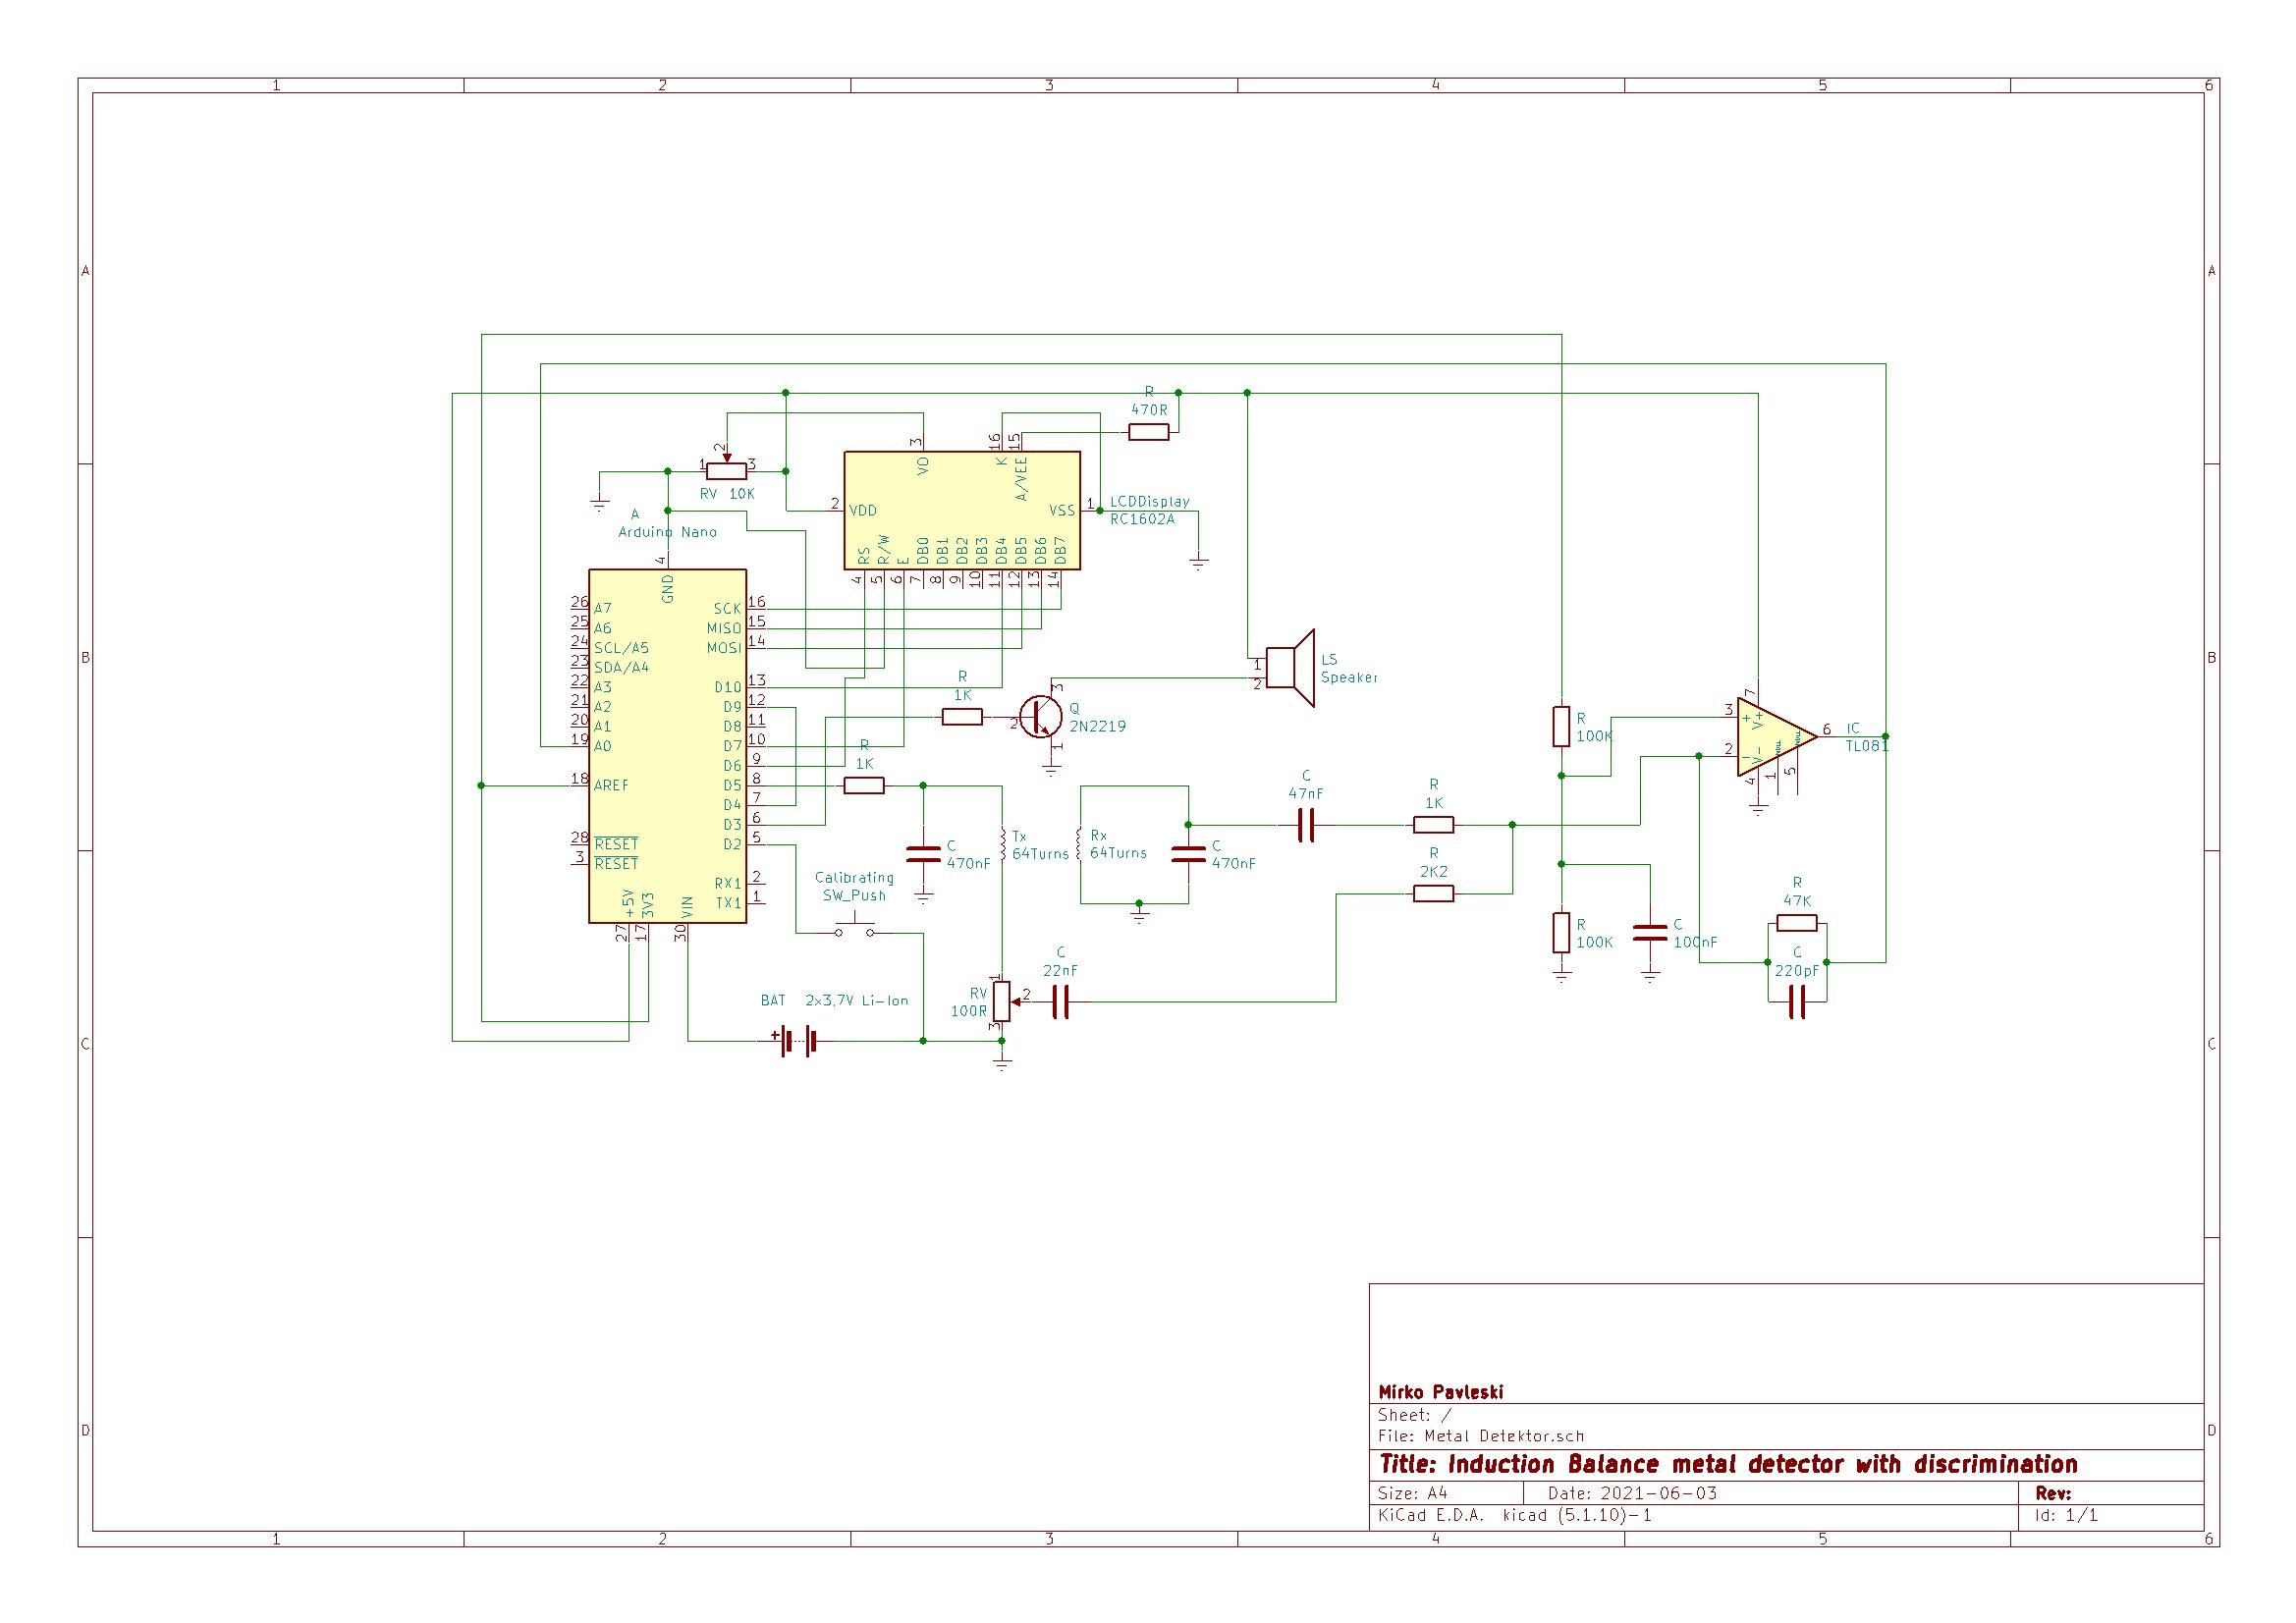 Arduino metal detector with discrimination 0udce2arci